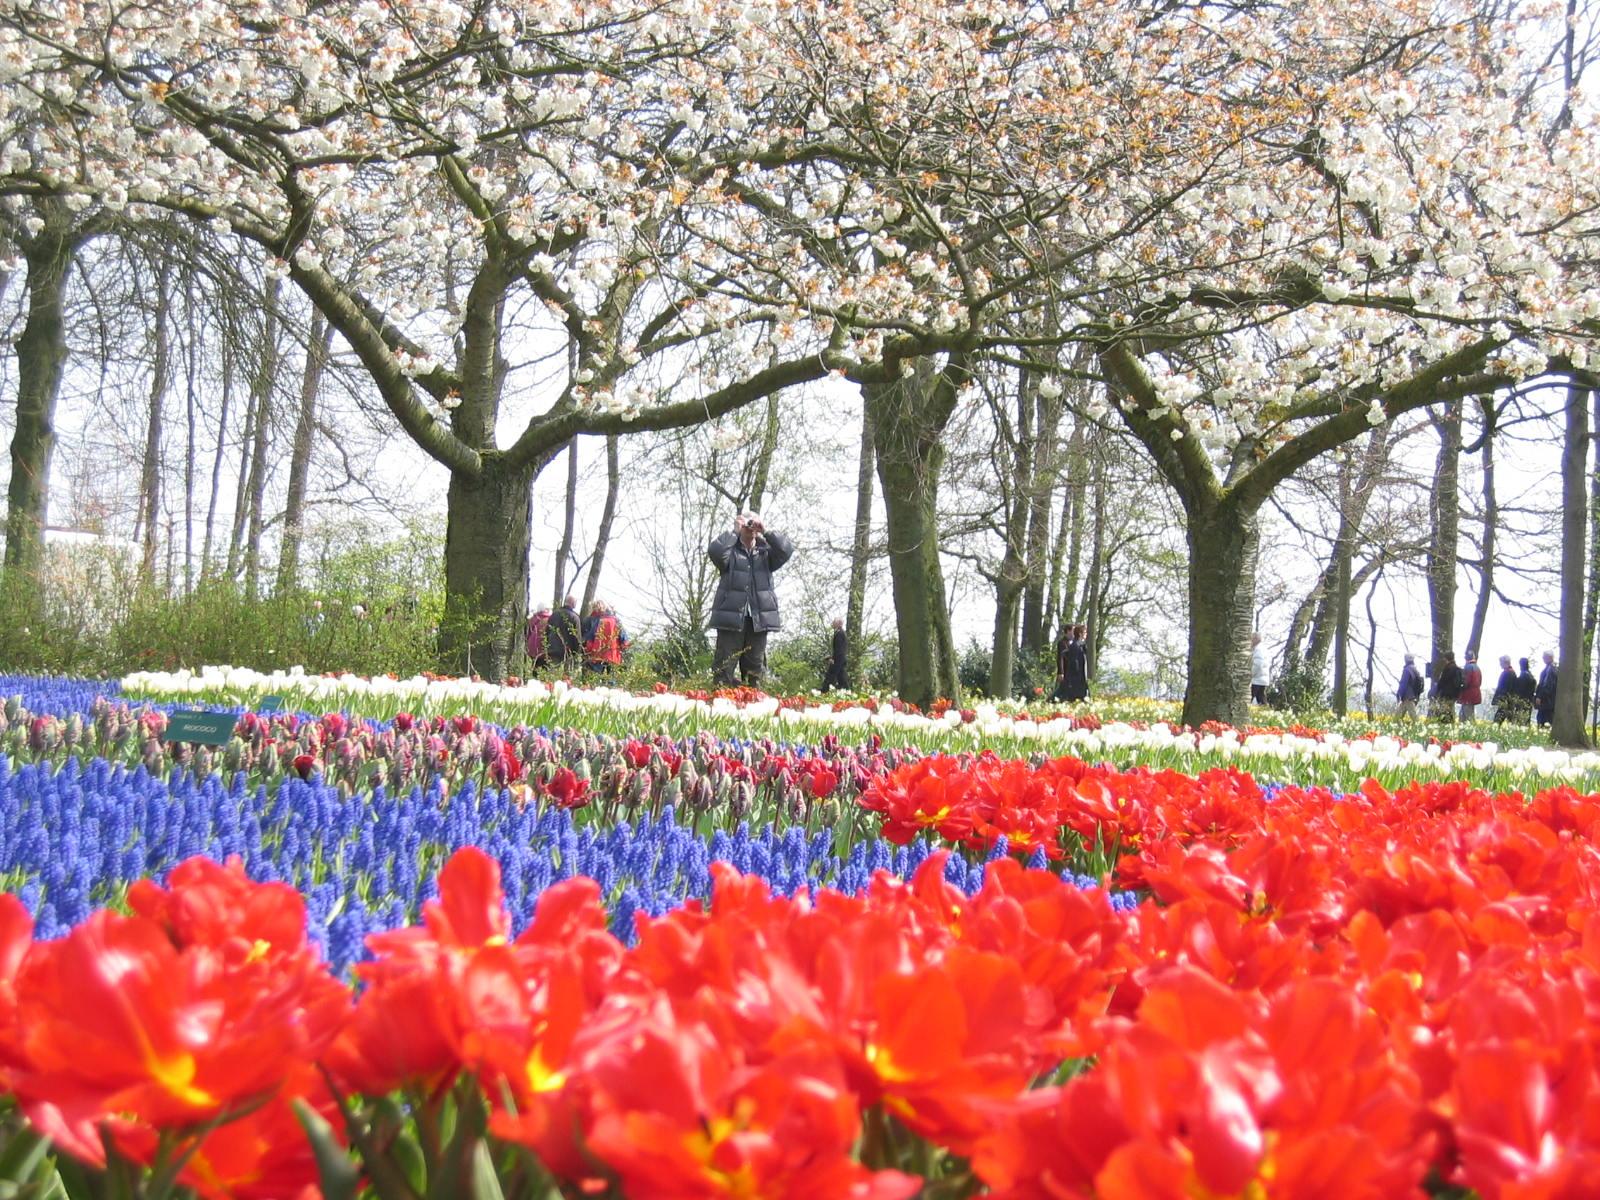 http://mirza.persiangig.com/holand_hamborg_trip/holand_hamborg_avril_2008%20149.jpg